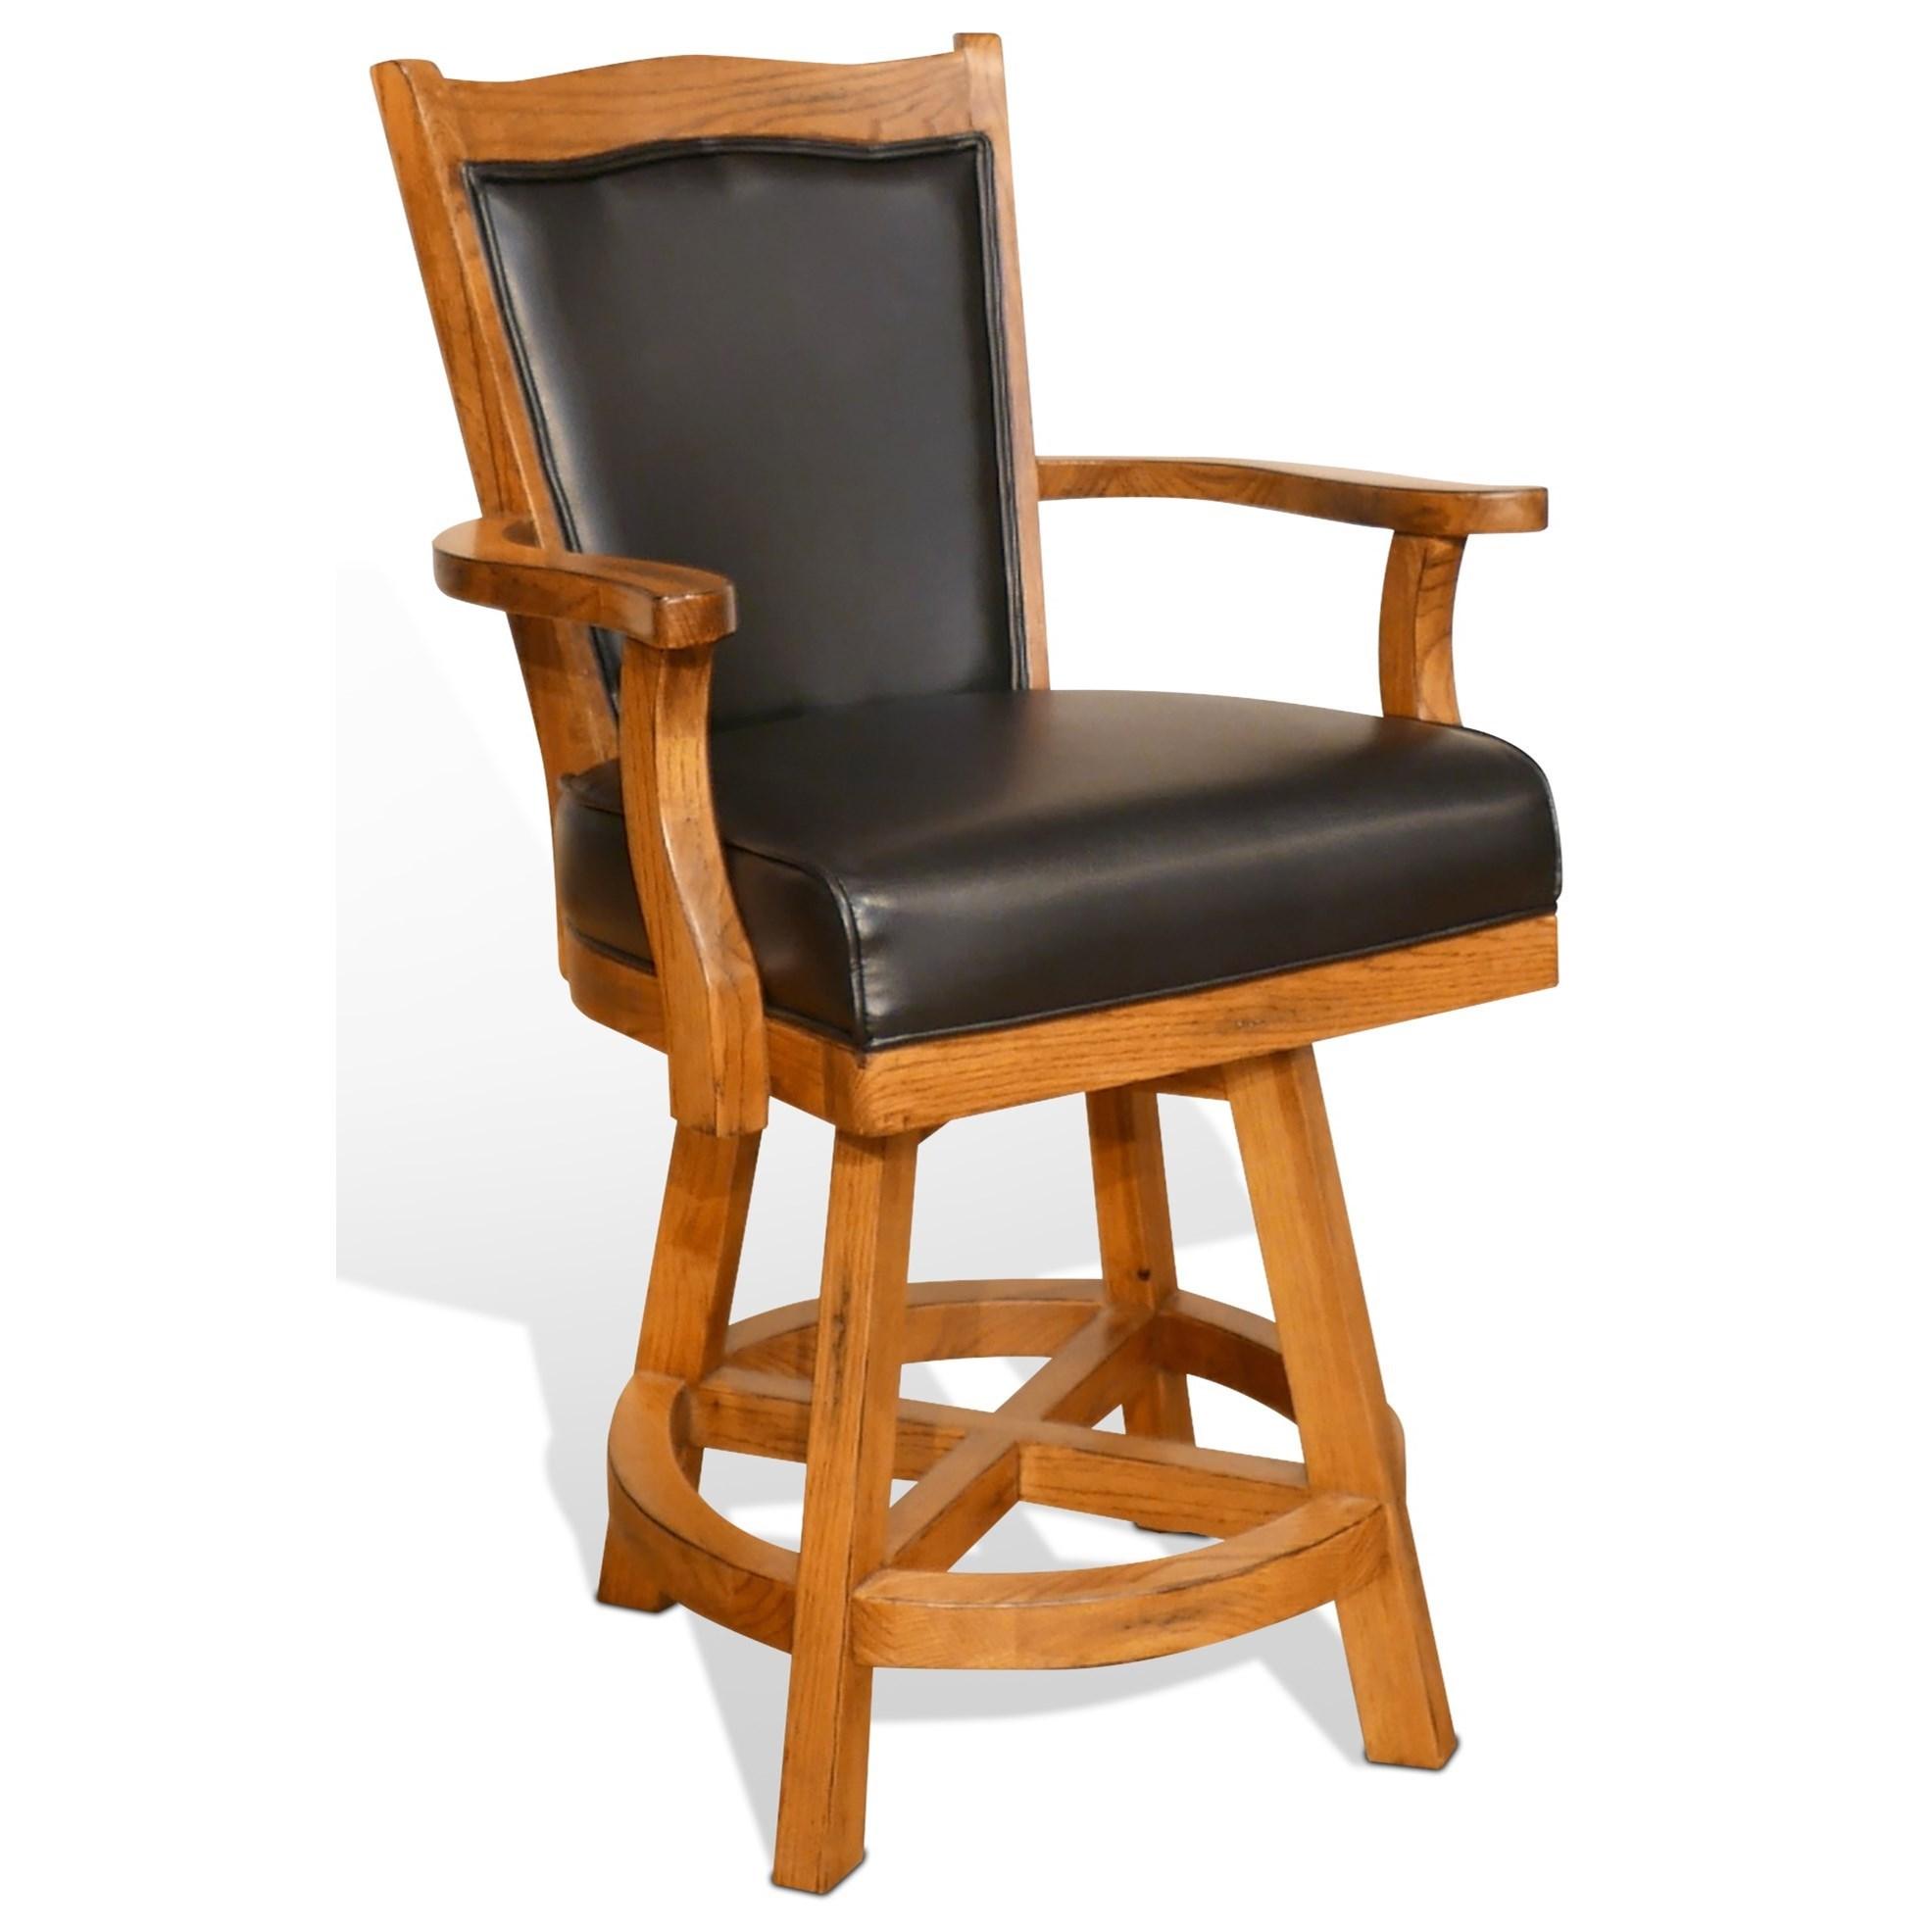 "Sunny Designs Sedona 24"" Cushionback Barstool w/ Swivel - Item Number: 1411RO-24"